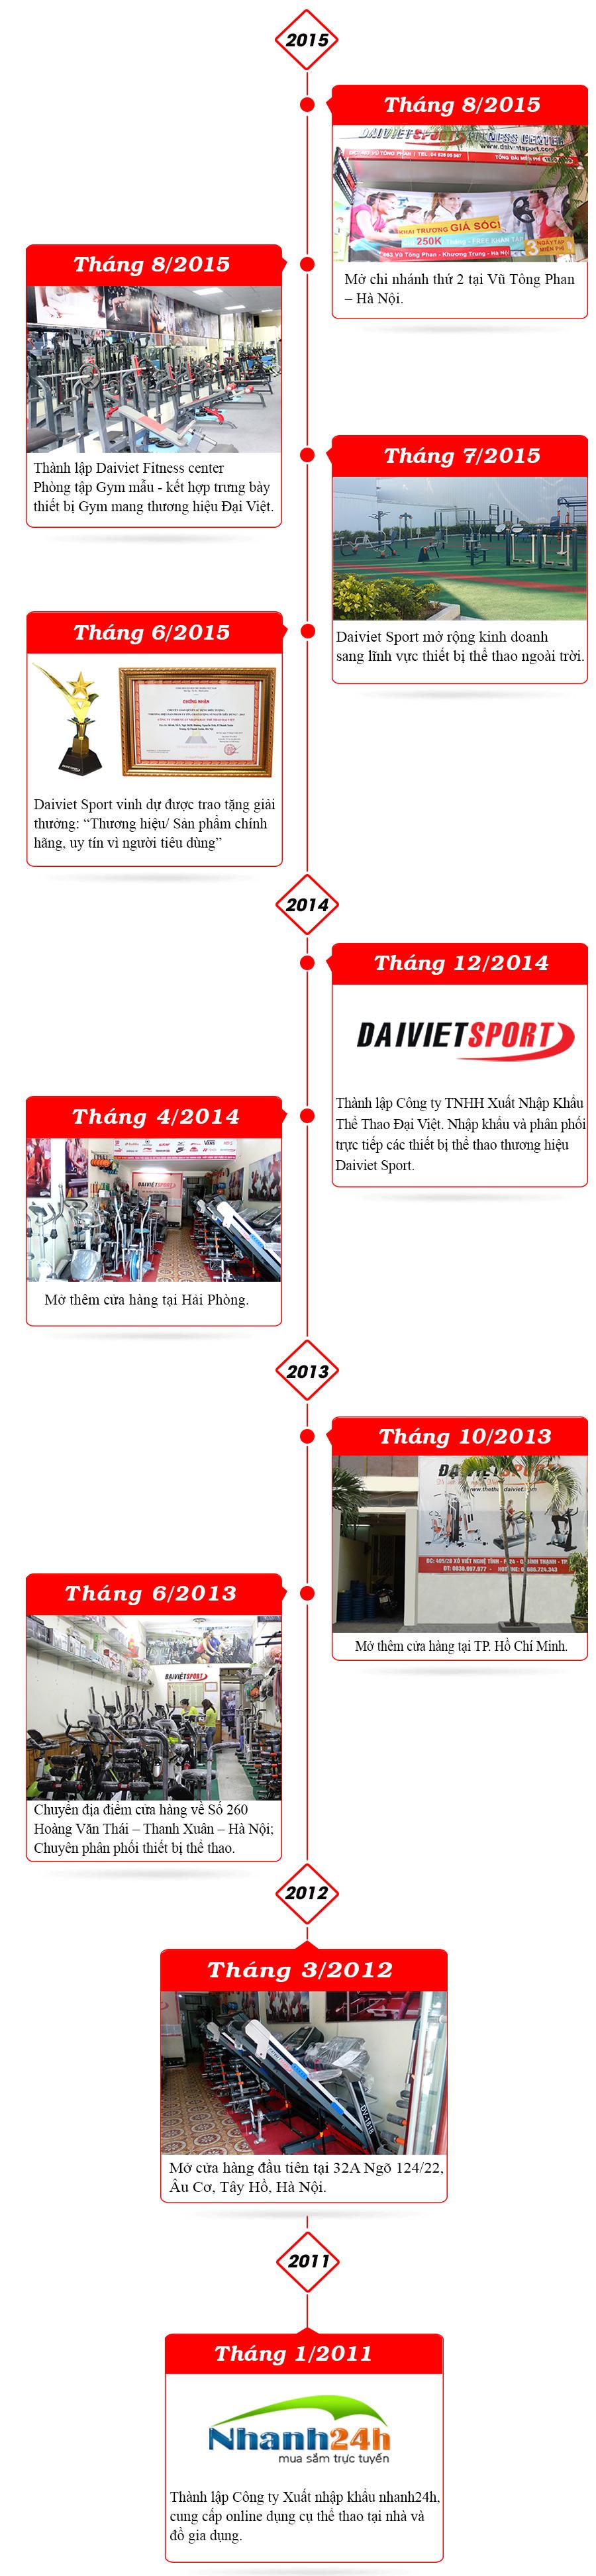 Lịch sử phát triển Daivviet Sport